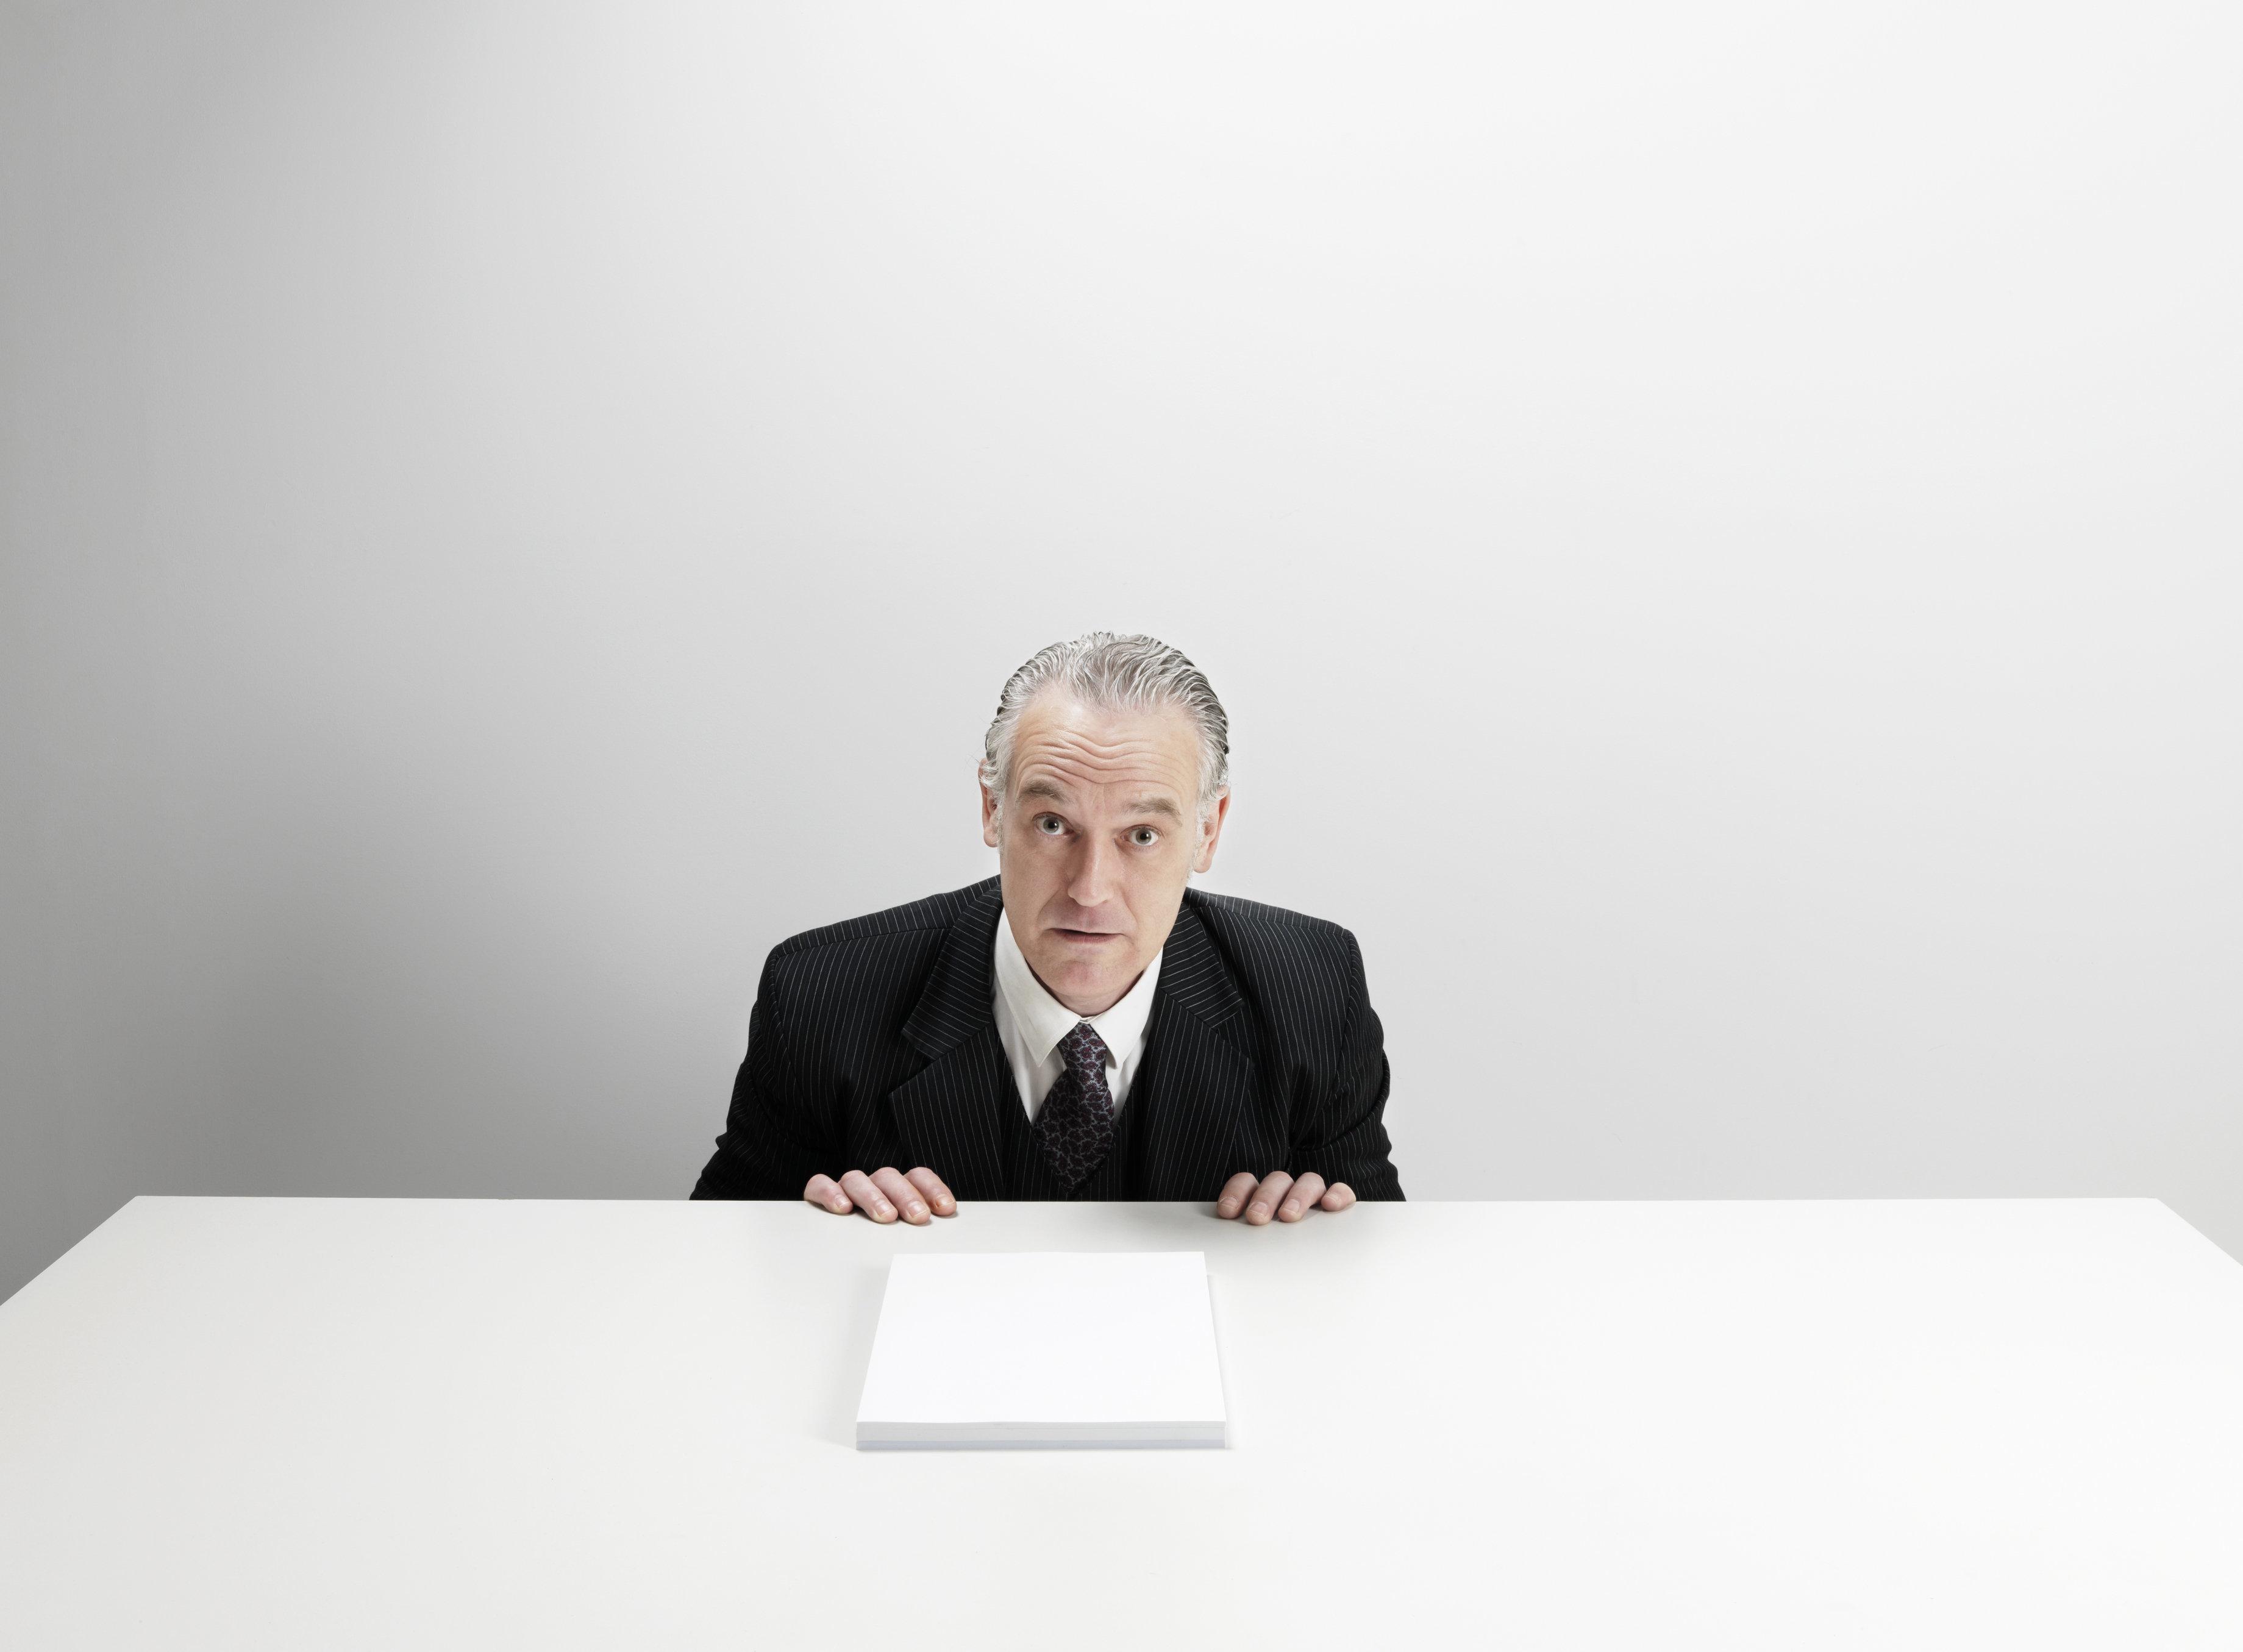 man in suit behind desk looking surprised,49-50 years,studio shot,white paper,Business